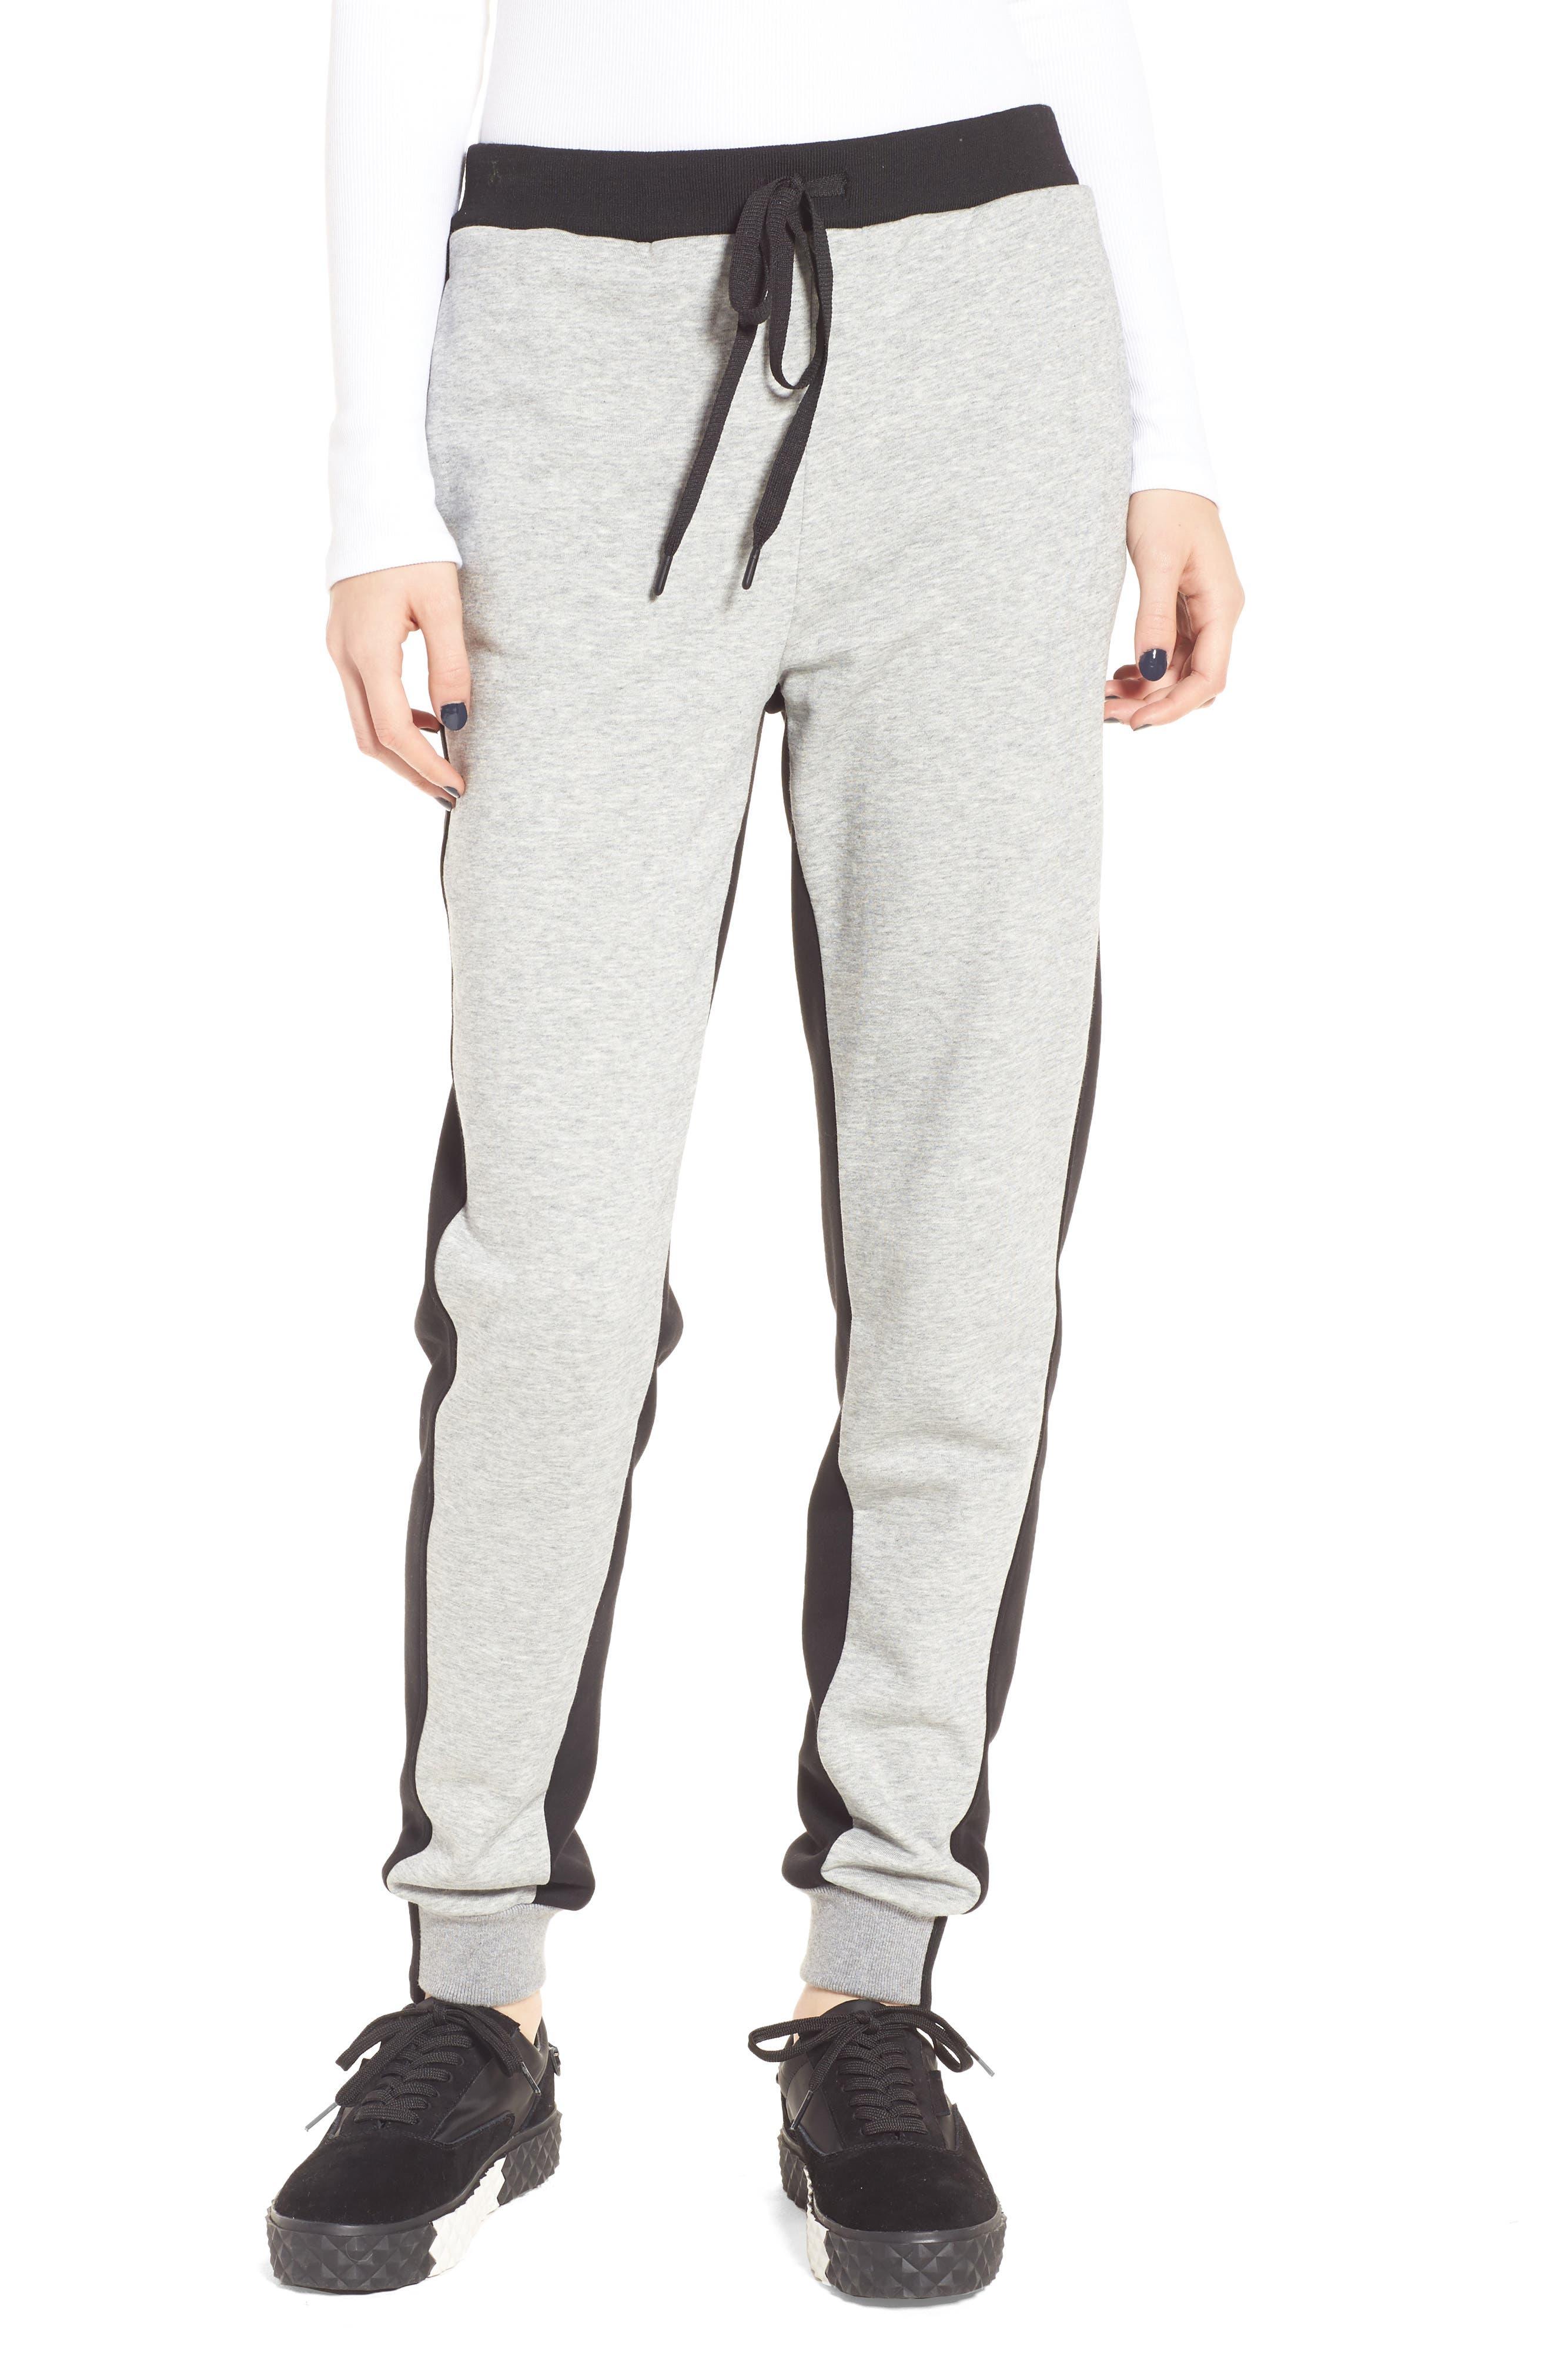 Paneled Sweatpants,                         Main,                         color, Black/ Med. Heather Grey